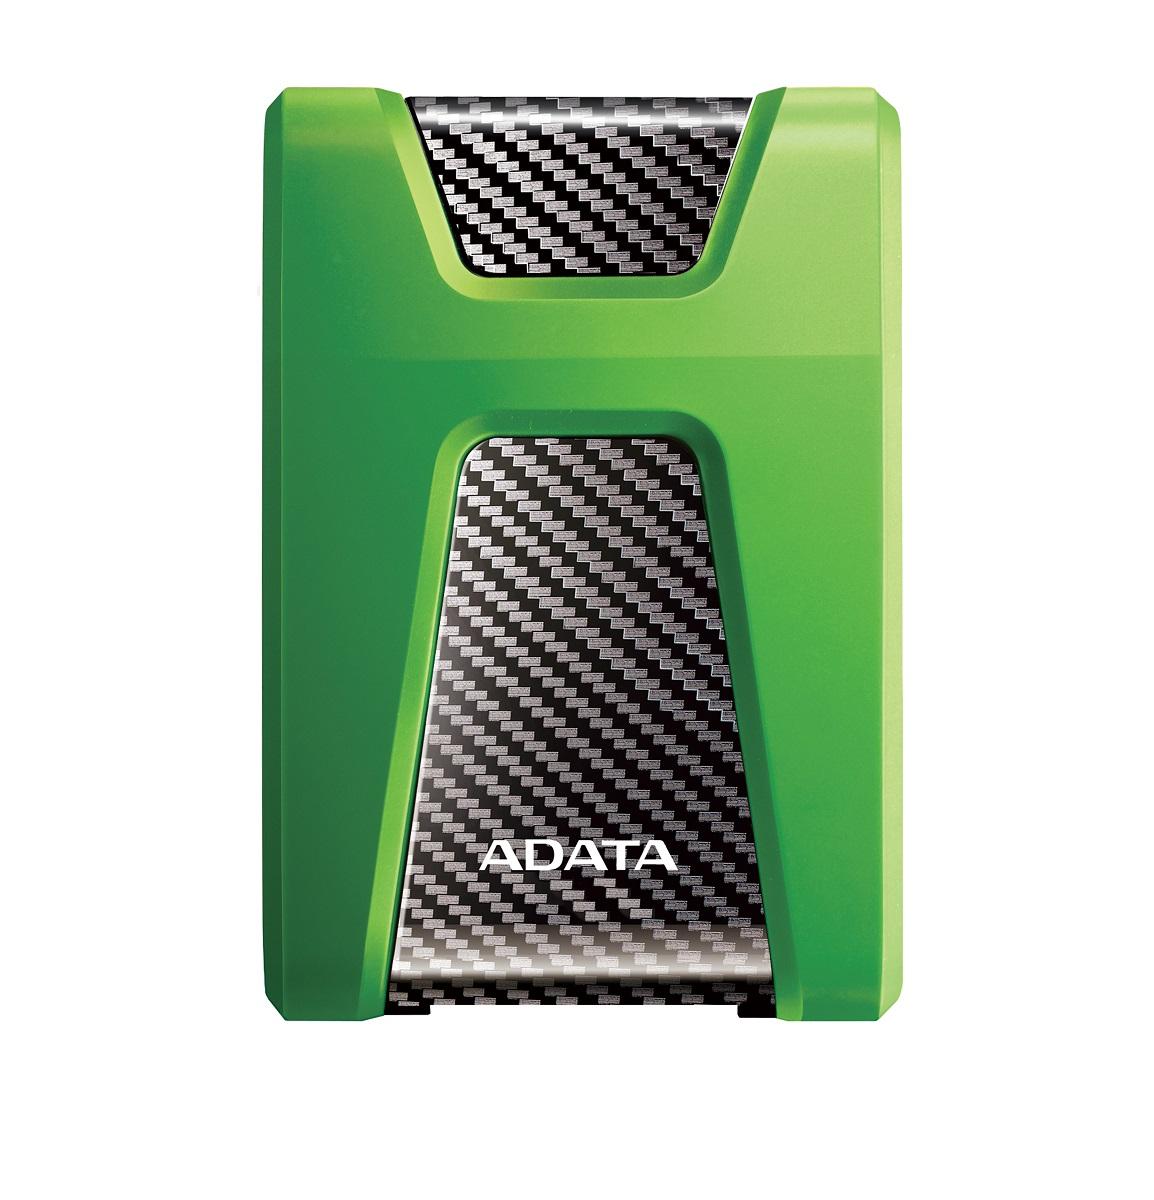 Supplier Generic Adata 2tb Durable External Hard Drives Compatible With Xbox (ahd650x - 2tu3 - cgn)